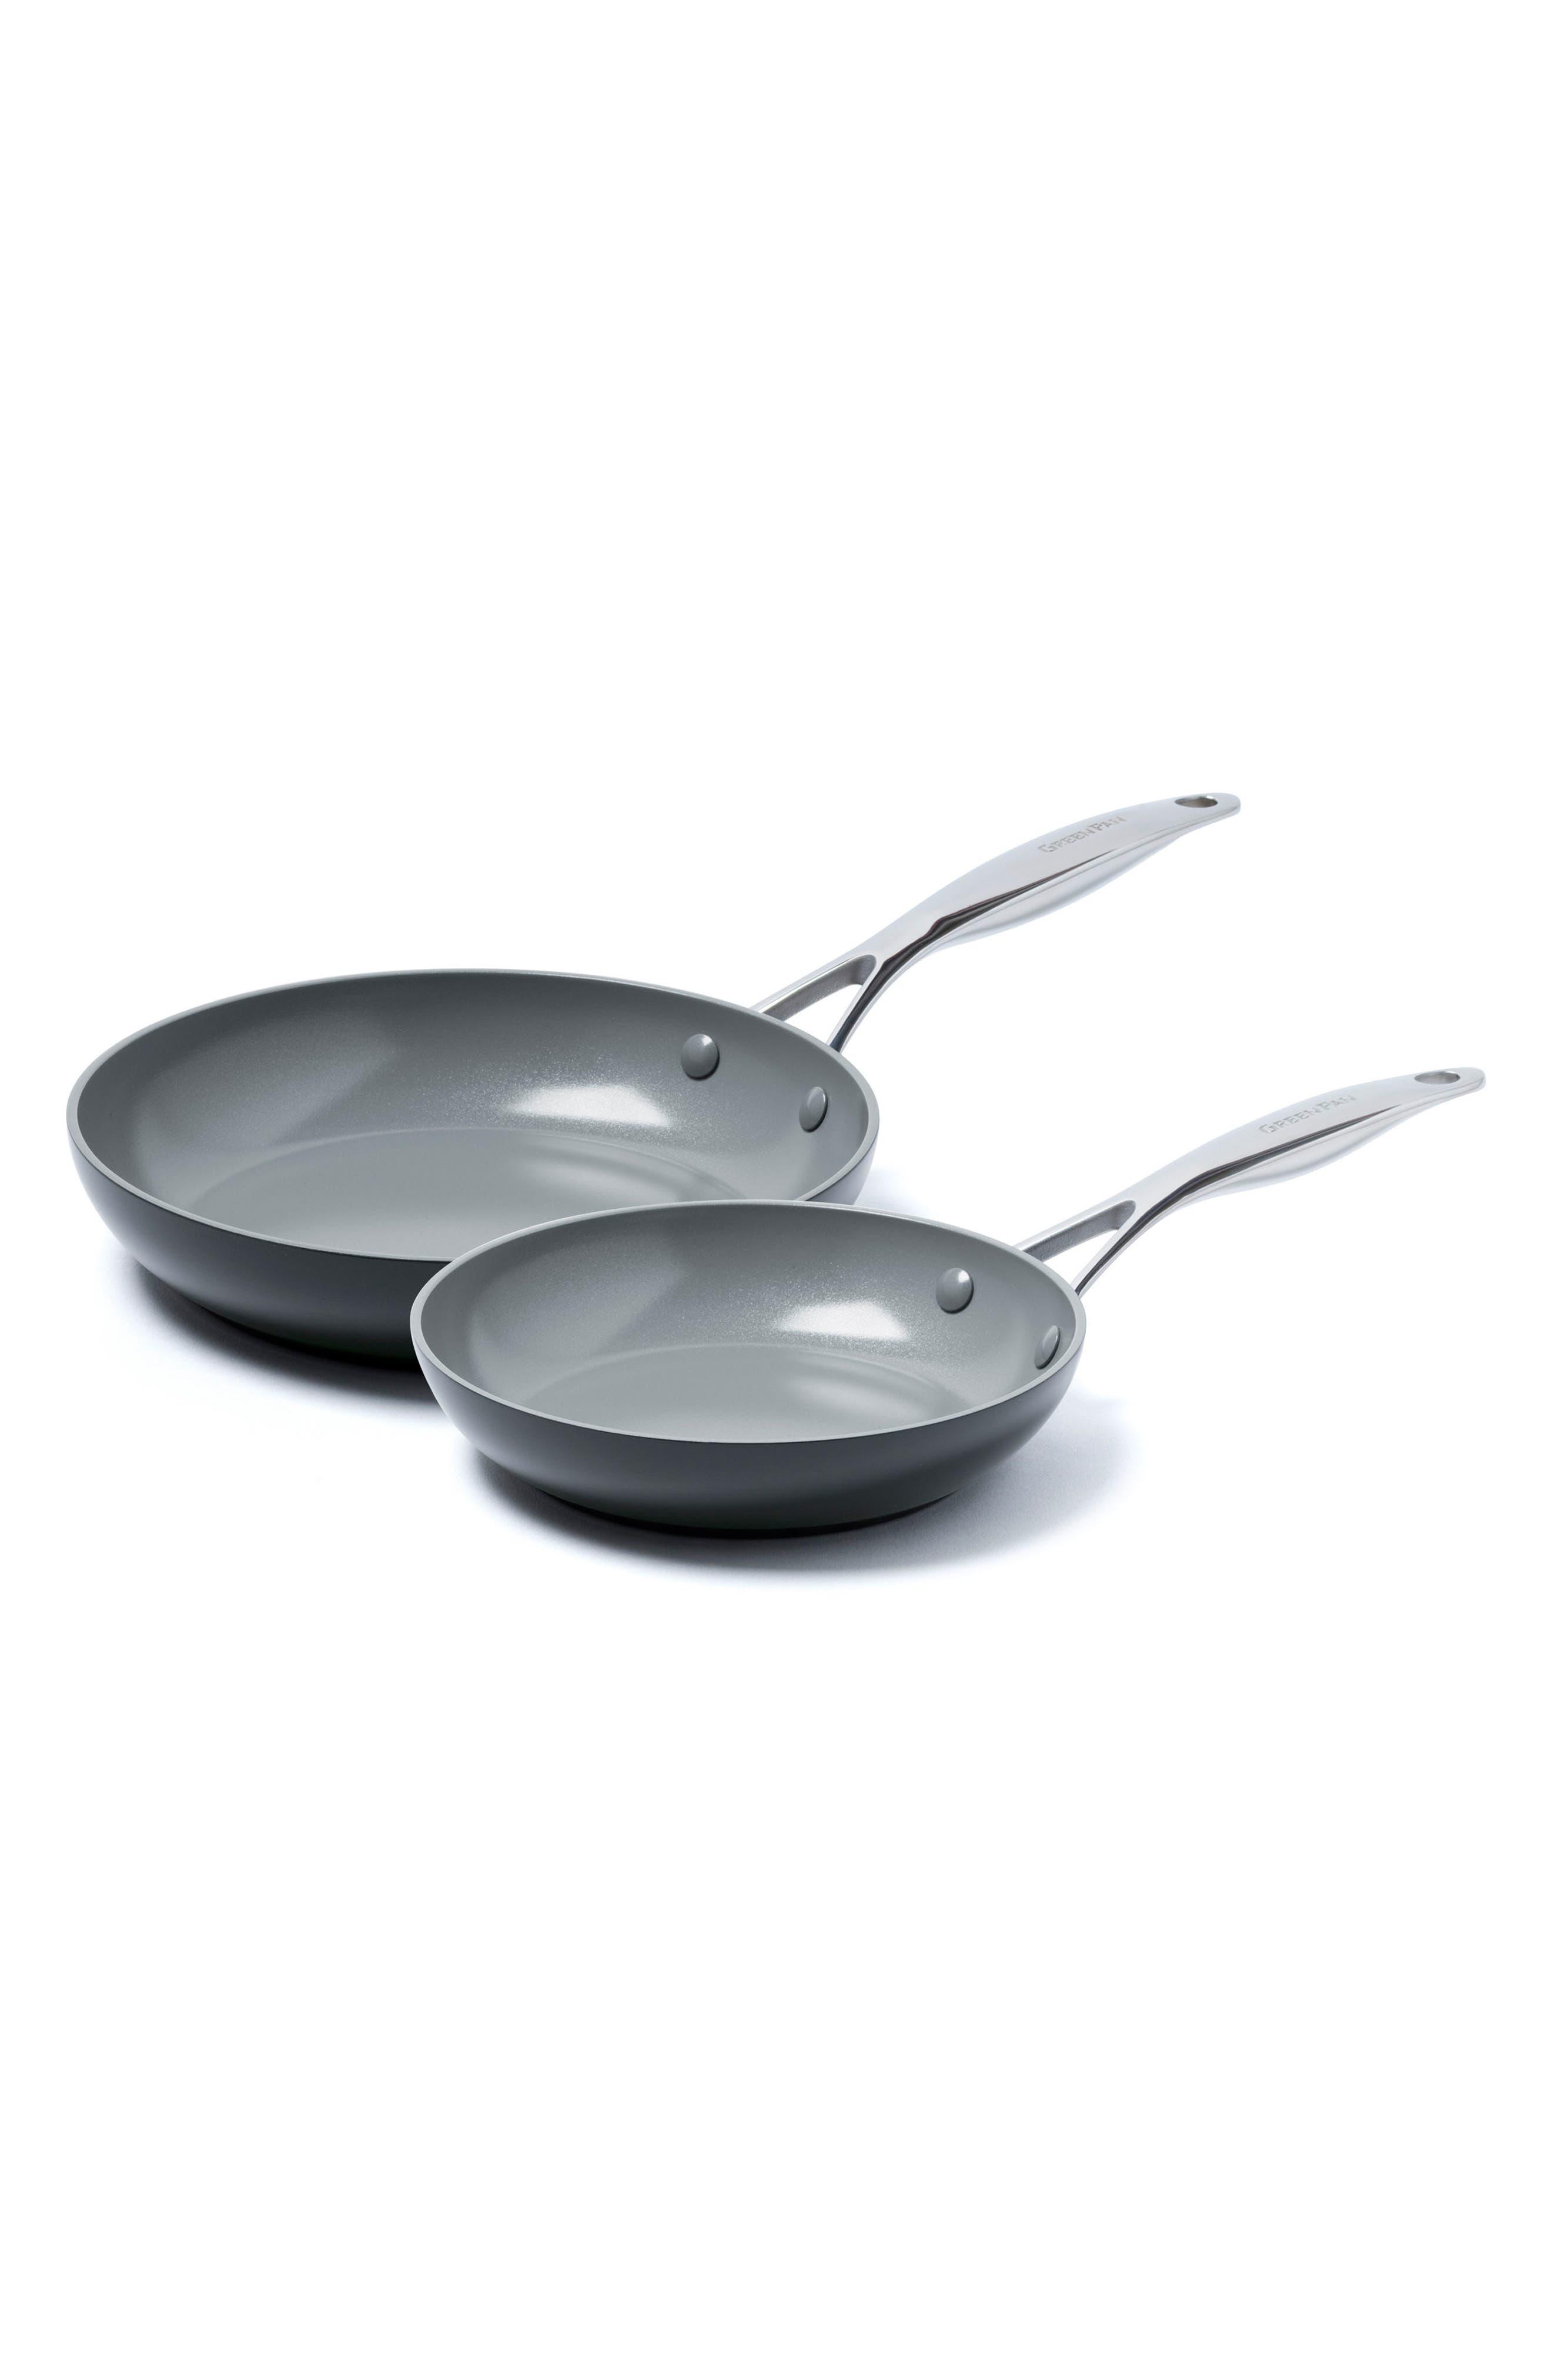 Valencia Pro 8-Inch & 10-Inch Anodized Aluminum Ceramic Nonstick Frying Pan Set,                             Main thumbnail 1, color,                             001